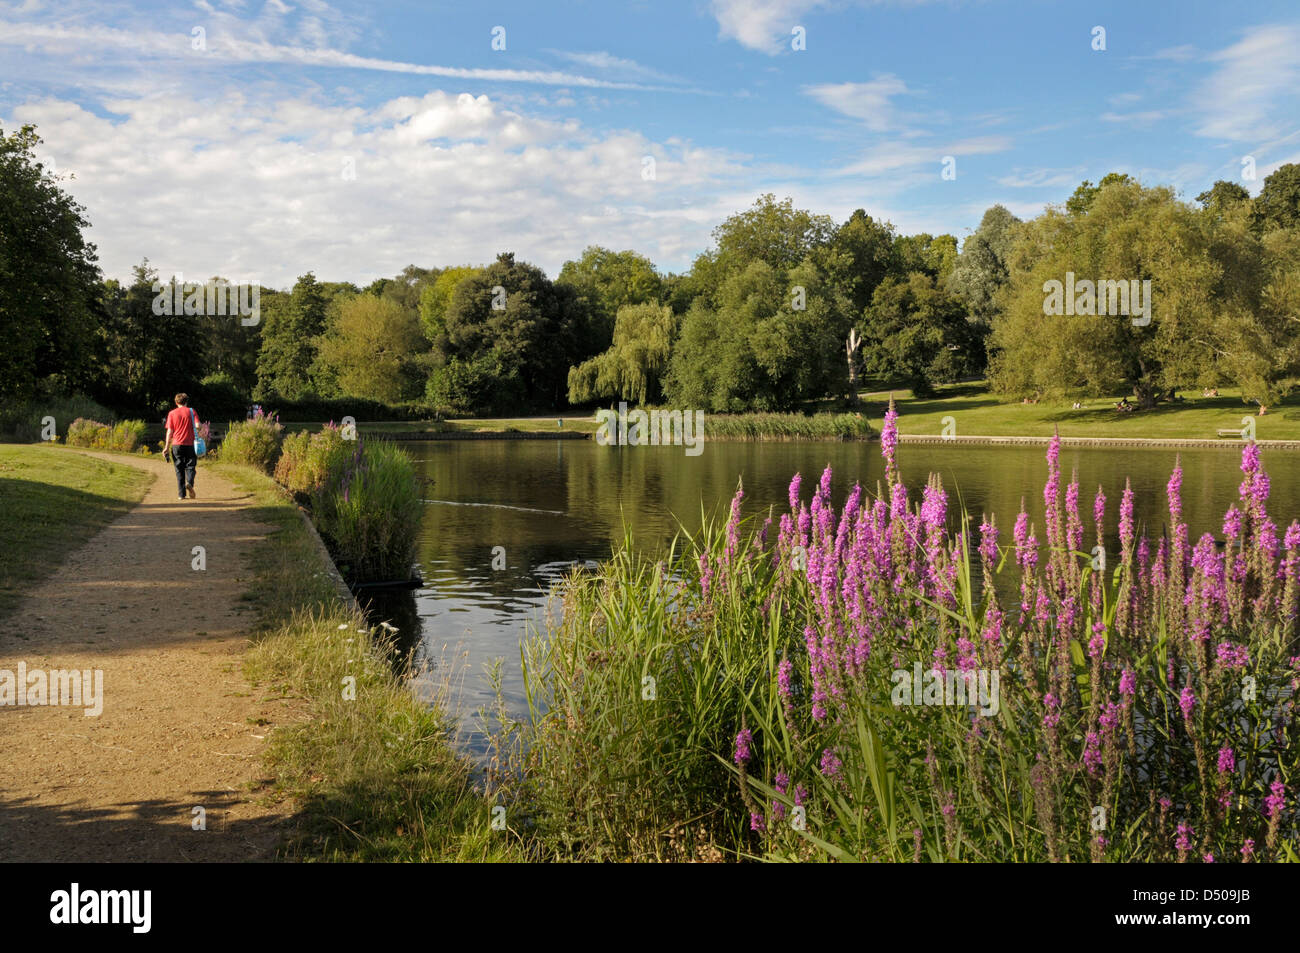 London, Hampstead Heath, Highgate ponds, the 'model boating pond'. - Stock Image